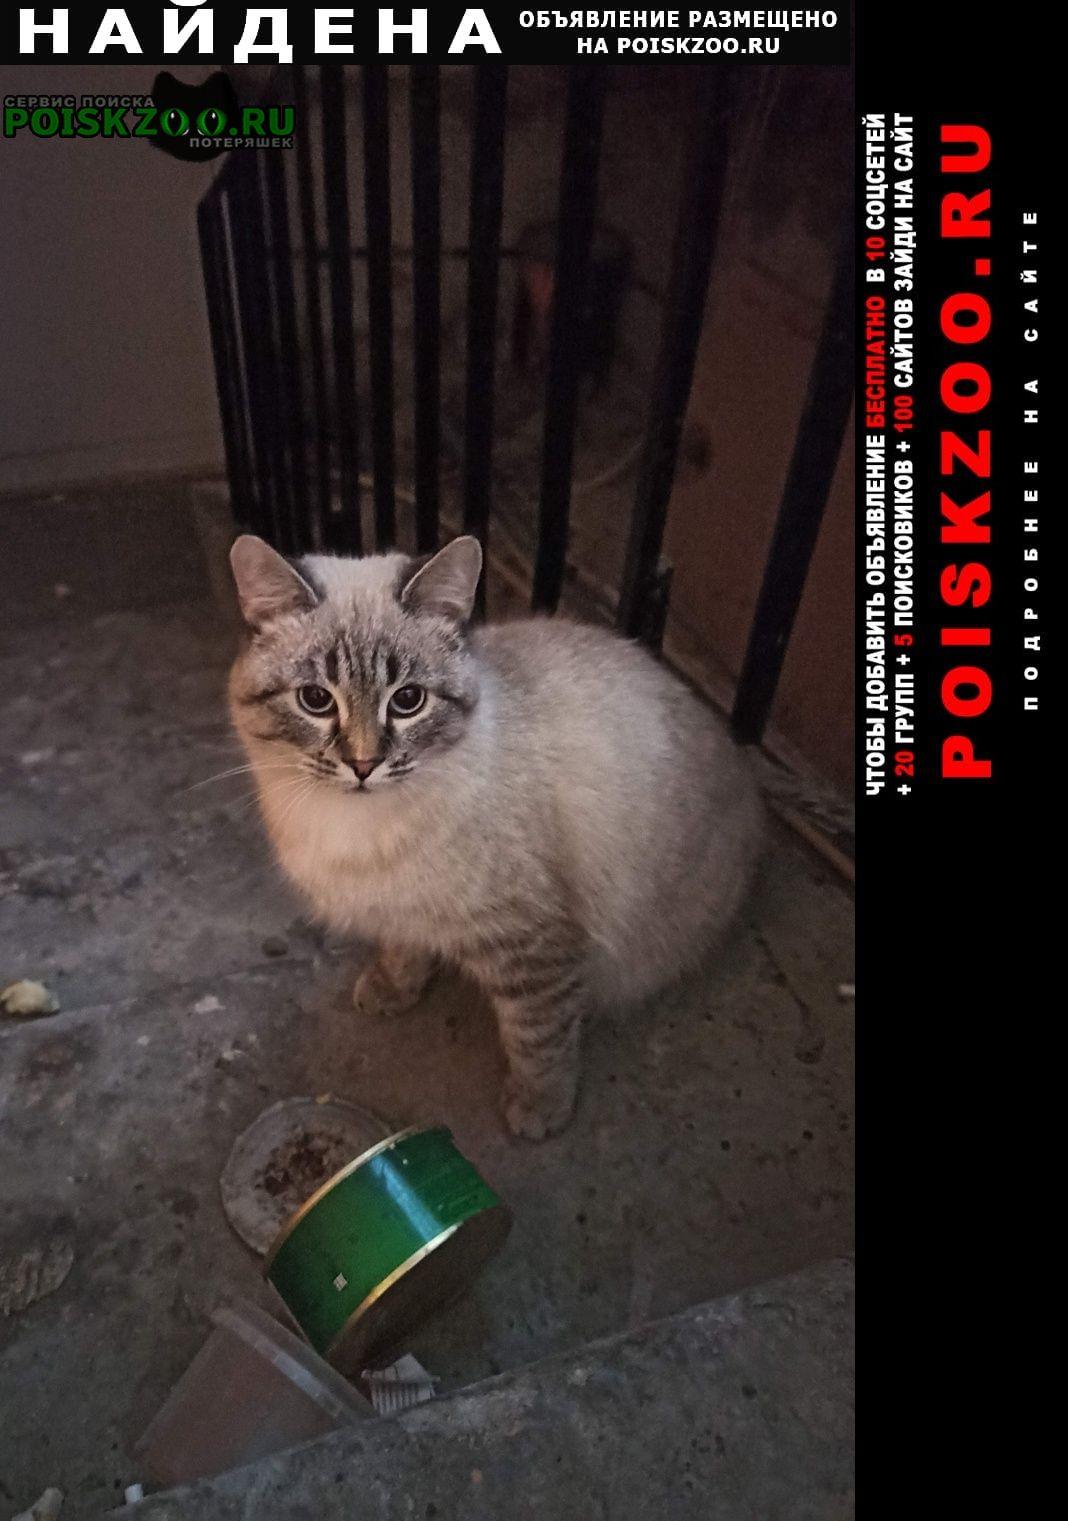 Найдена кошка район всо Саратов